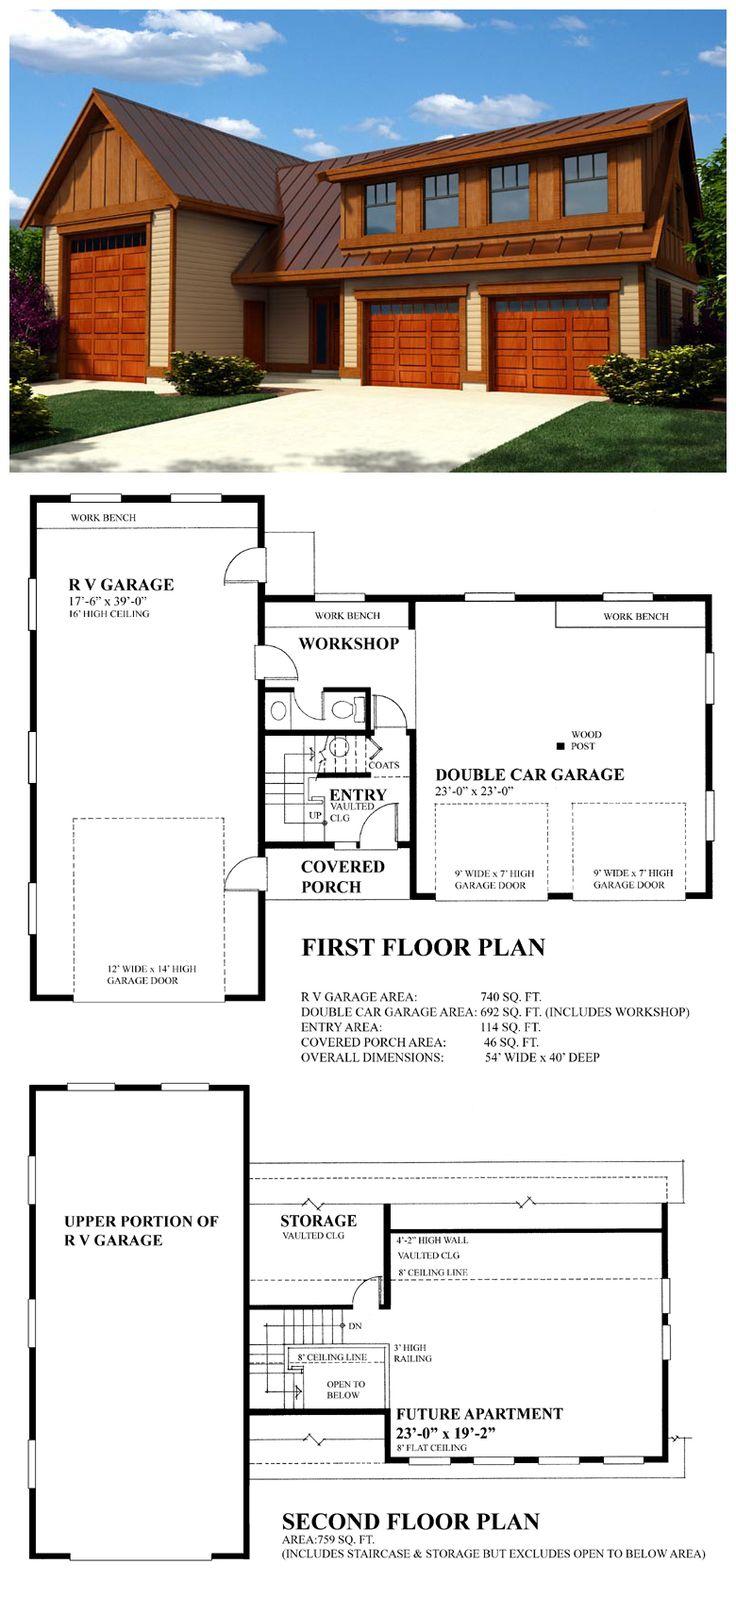 27 best images about 3 car garage plans on pinterest for Double garage plans